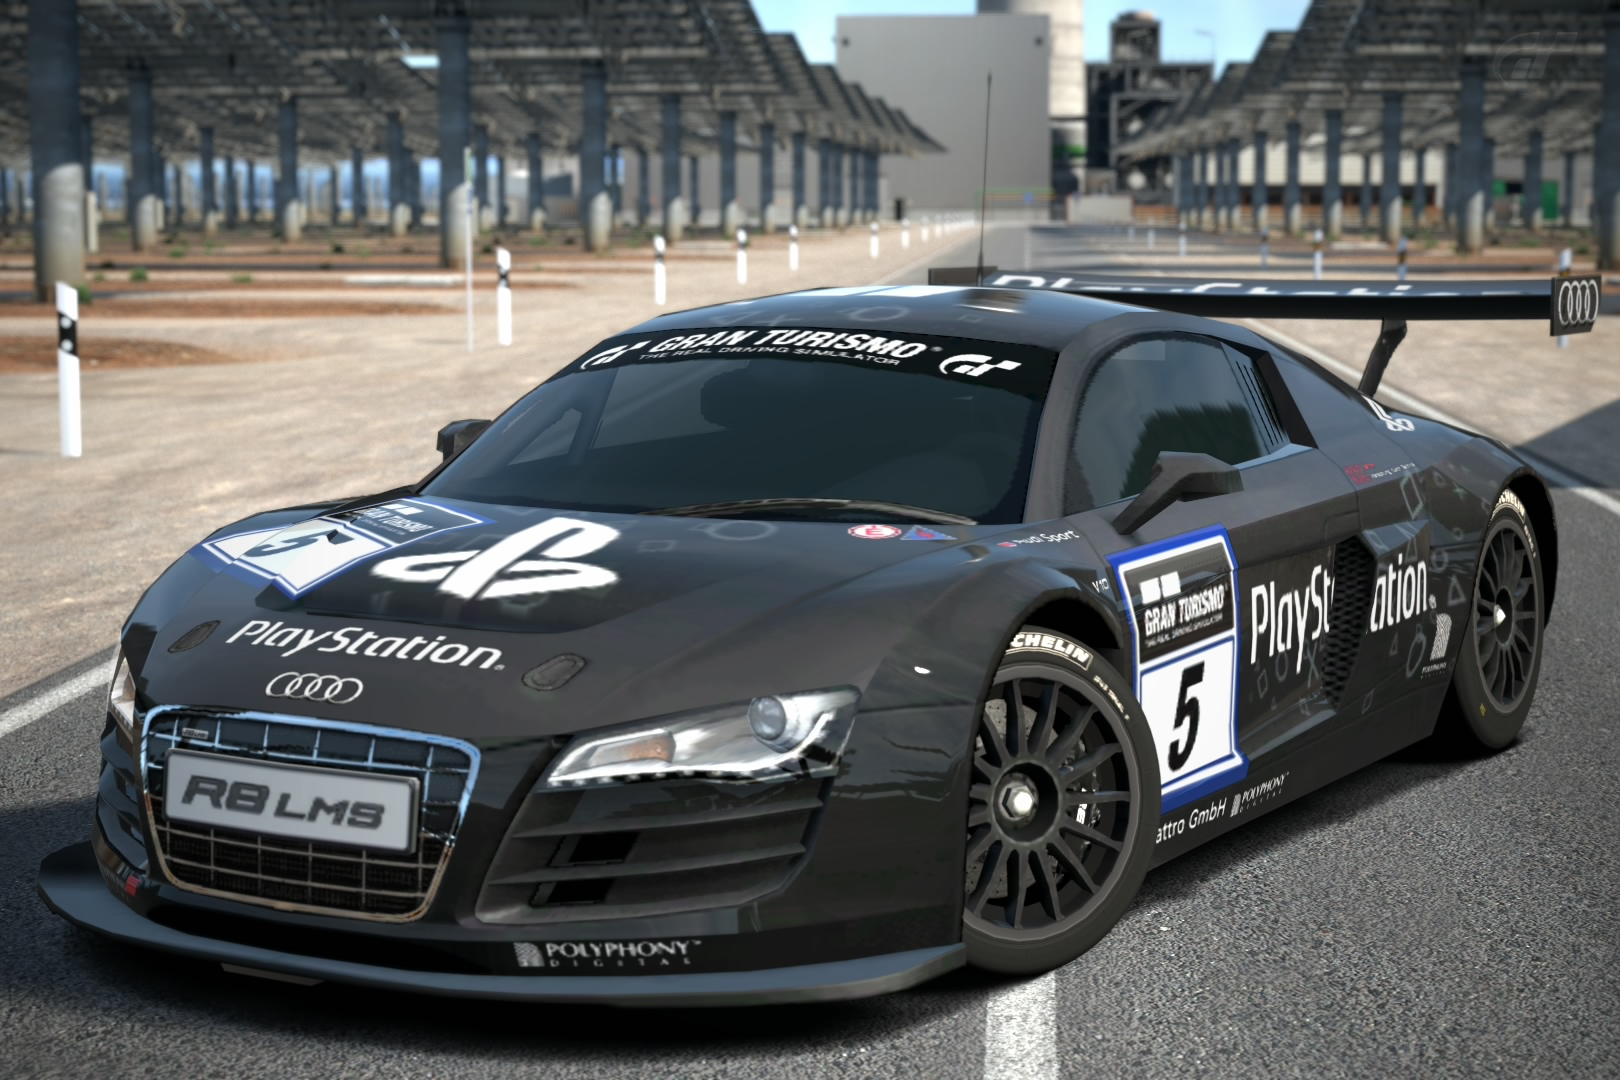 Audi R LMS Race Car Team PlayStation Gran Turismo Wiki - Audi r8 race car 01 gt6